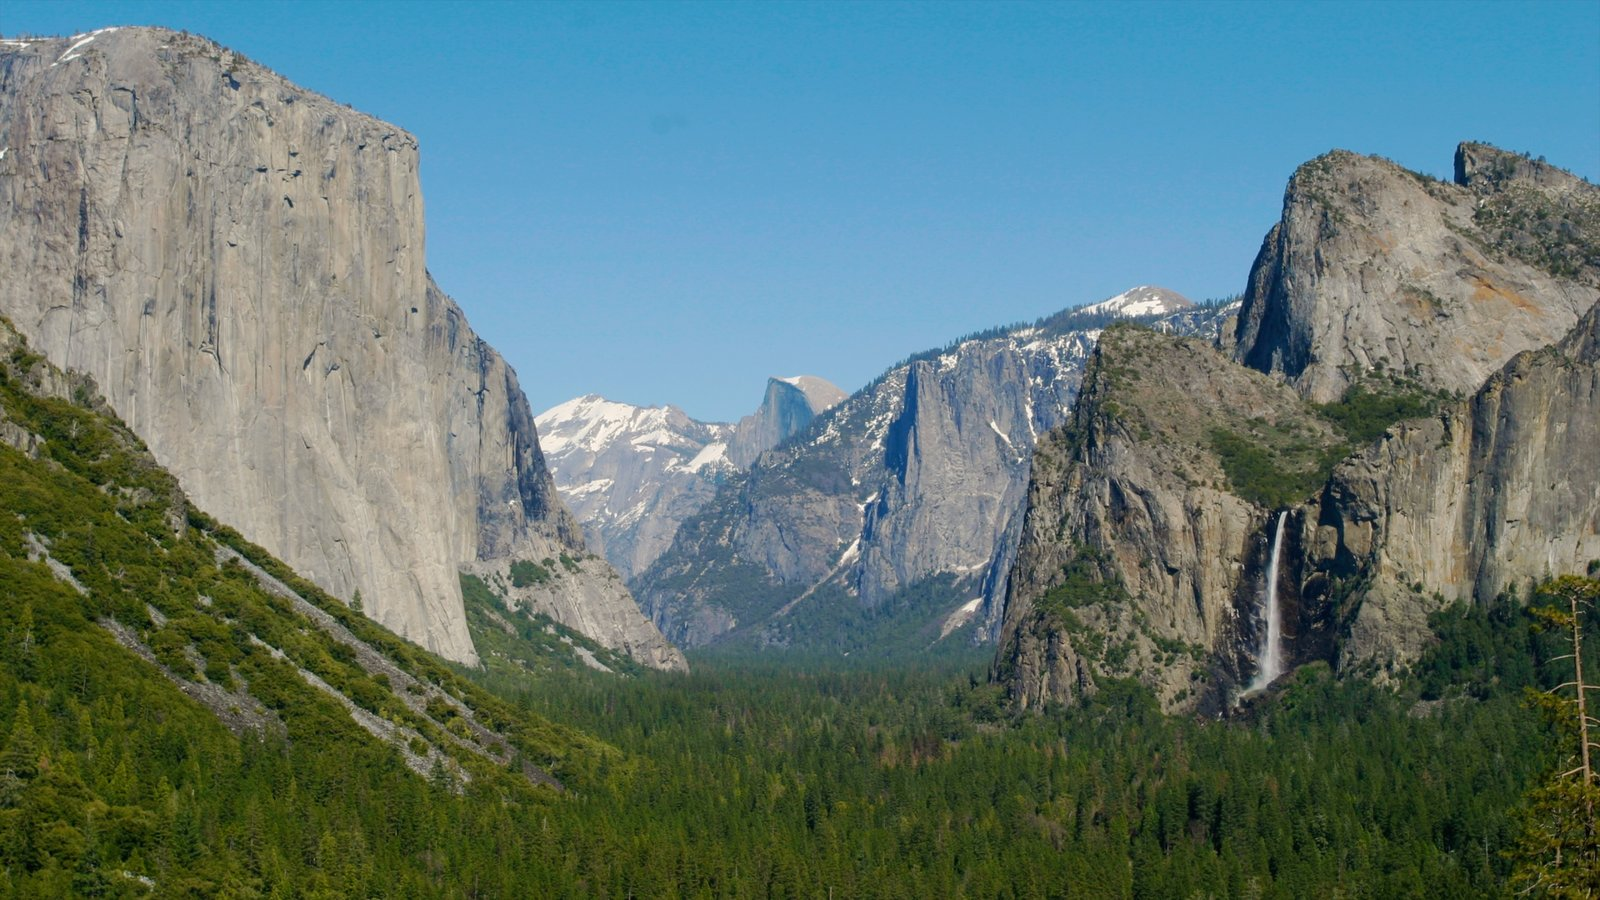 Yosemite Valley mostrando montanhas